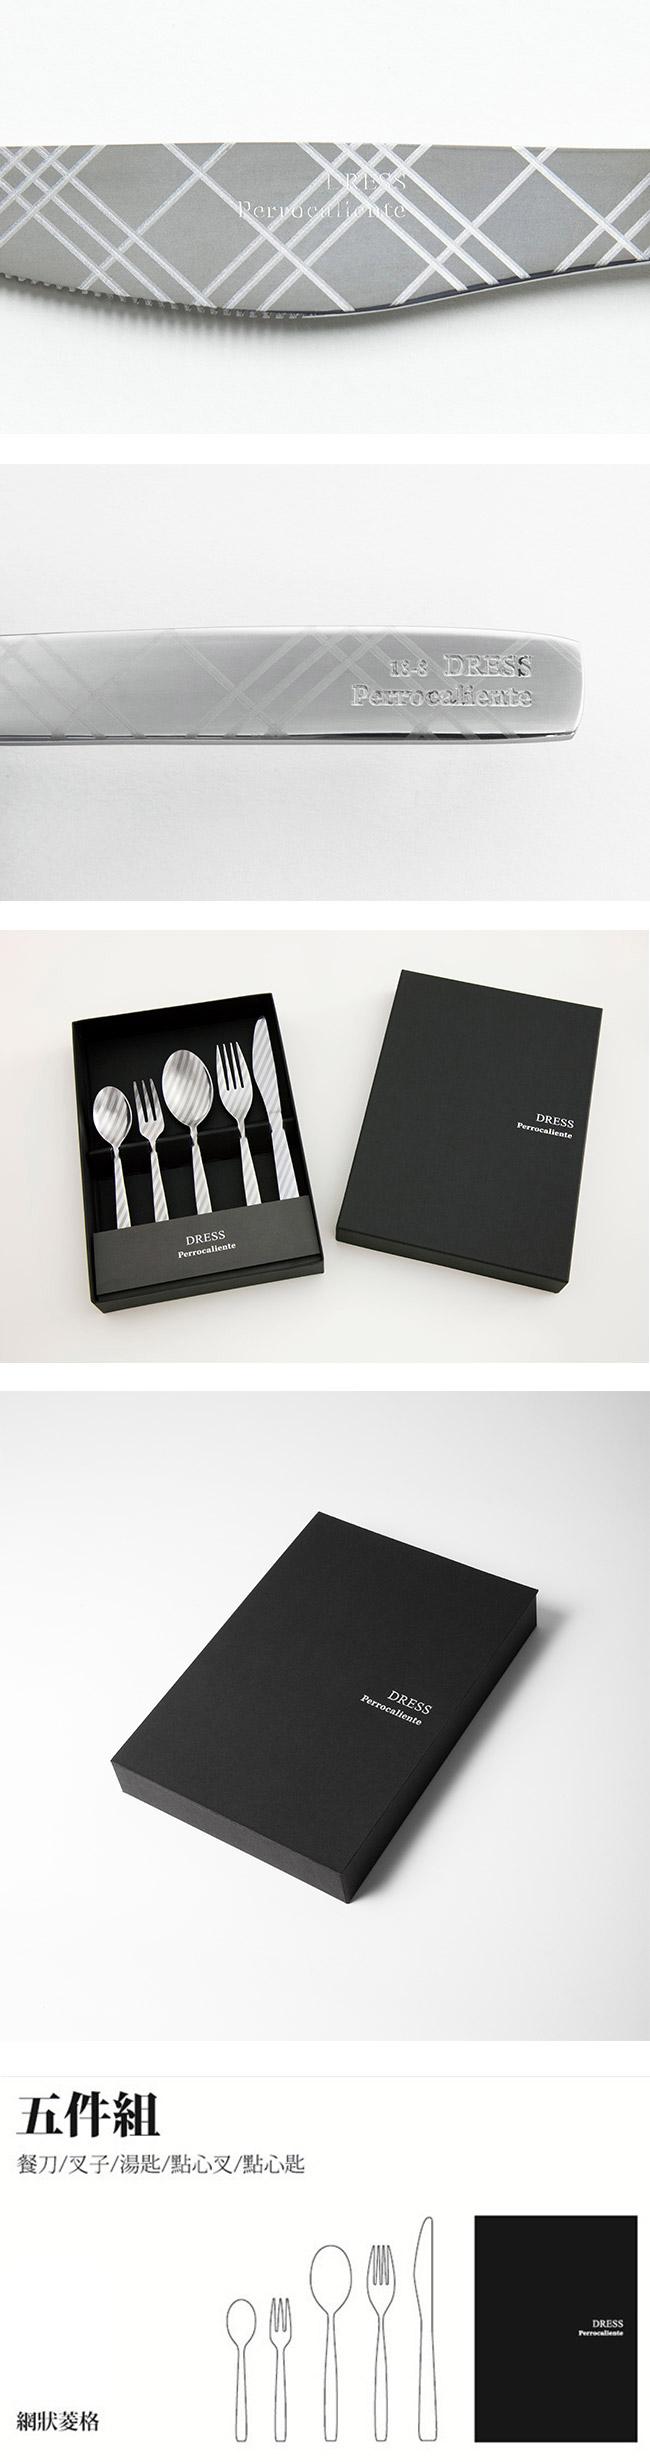 Perrocaliente Dress Gift Set 銀色盒裝餐具組 五件組 方格